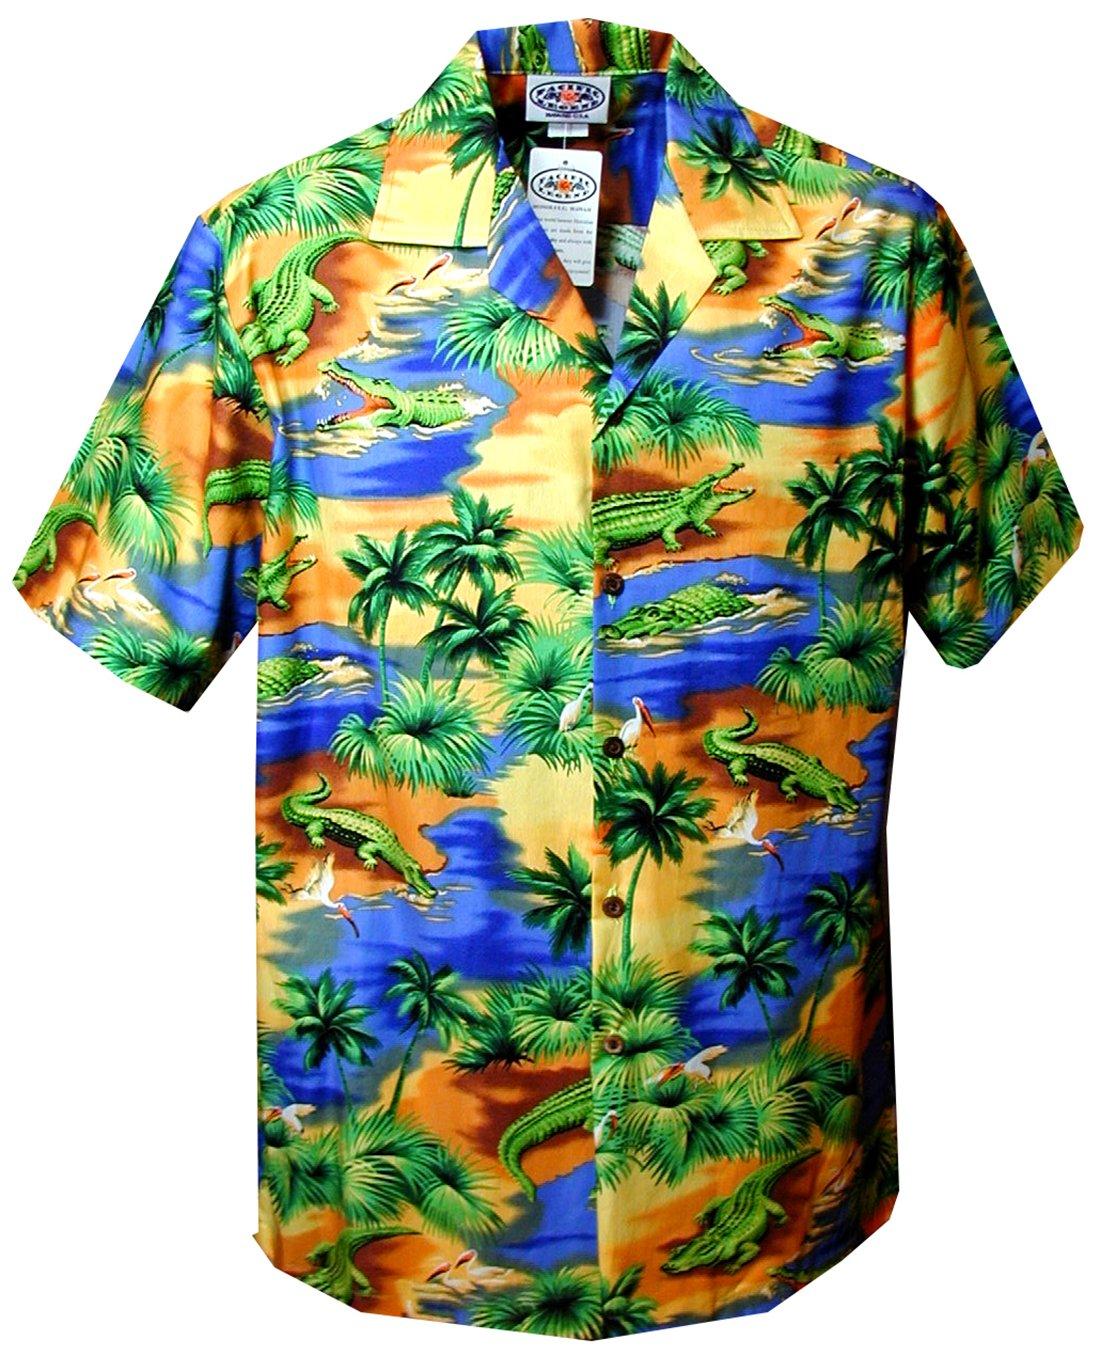 Pacific Legend Boys Florida Alligator Lagoon Shirt BLUE XL